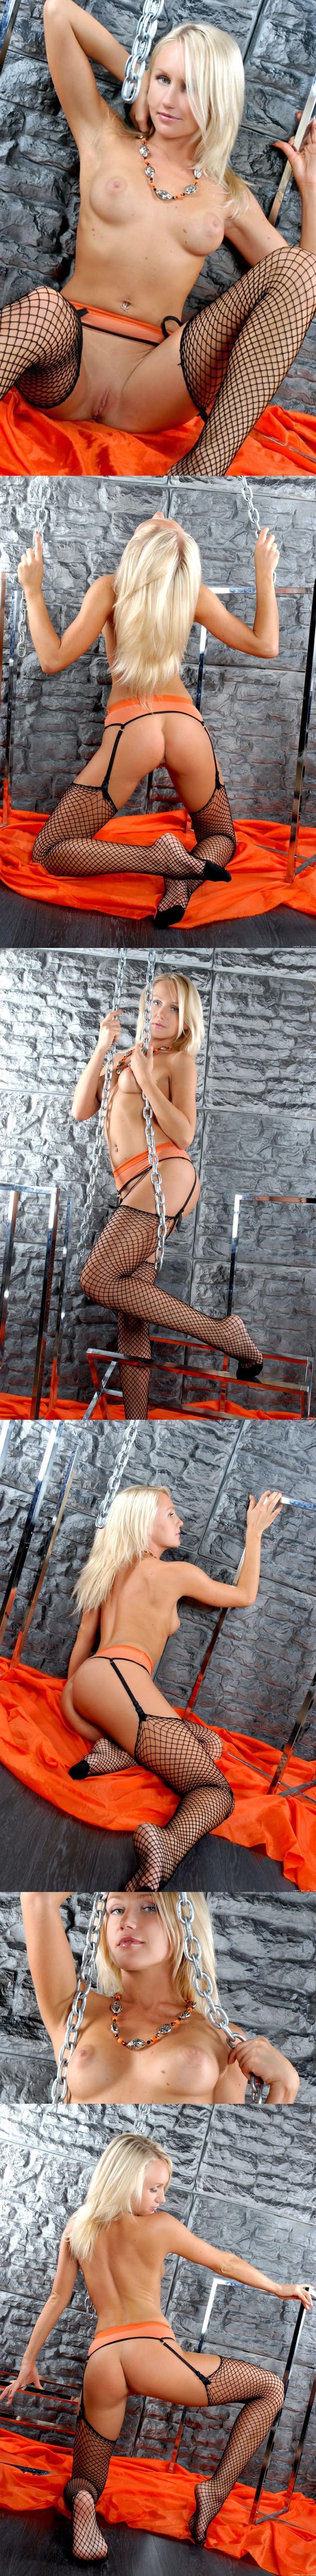 MA_20080921_-_Ashley_A_-_Presenting_-_by_Ingret.zip-jk- Met-Art MA 20080921 - Sofi A - Polline - by Sergey Goncharov